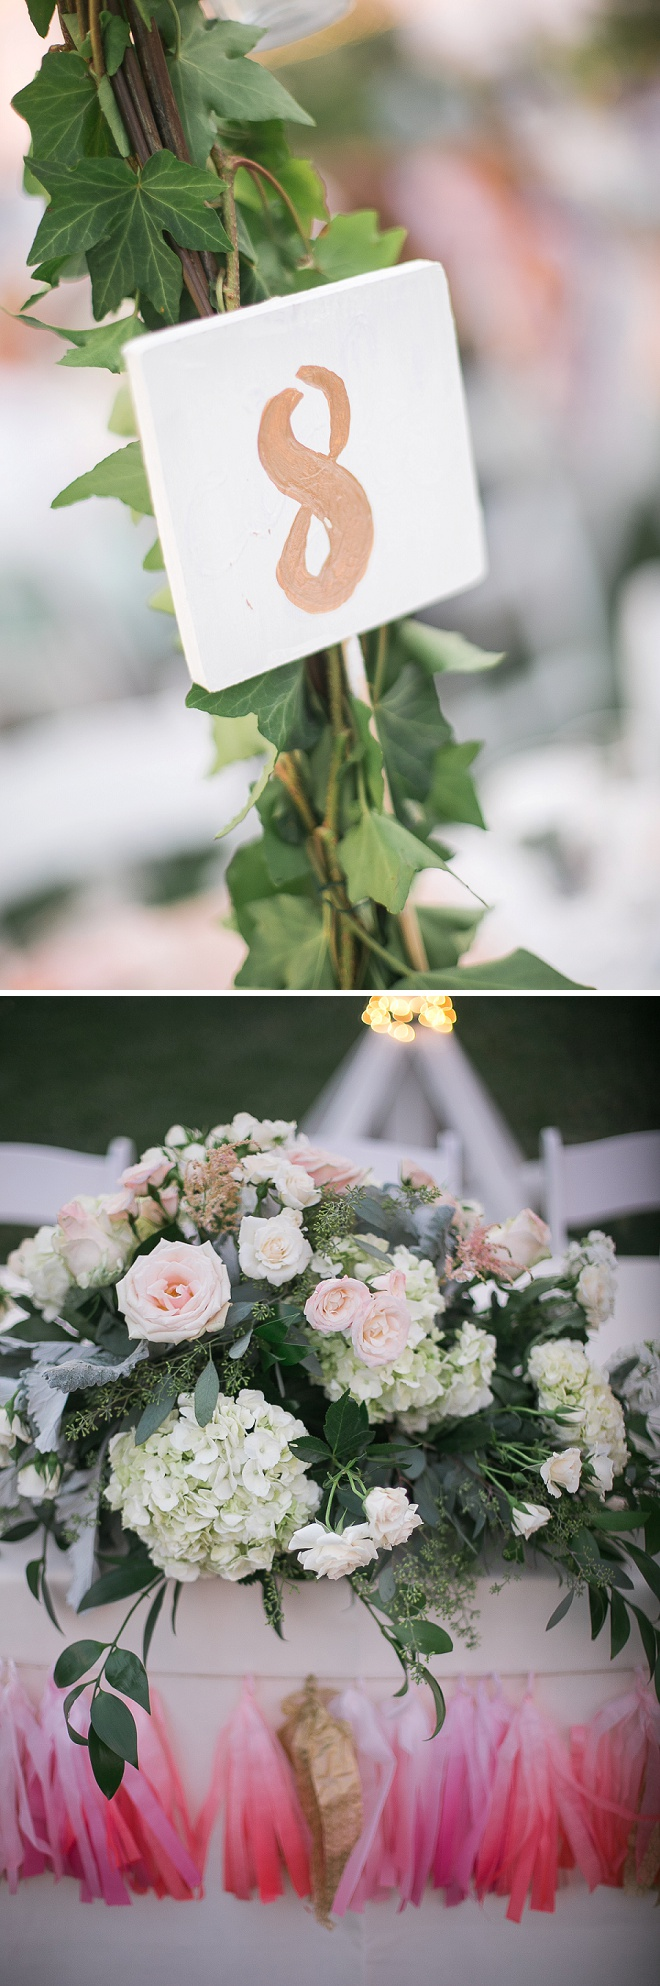 Gorgeous details at this gorgeous wedding!